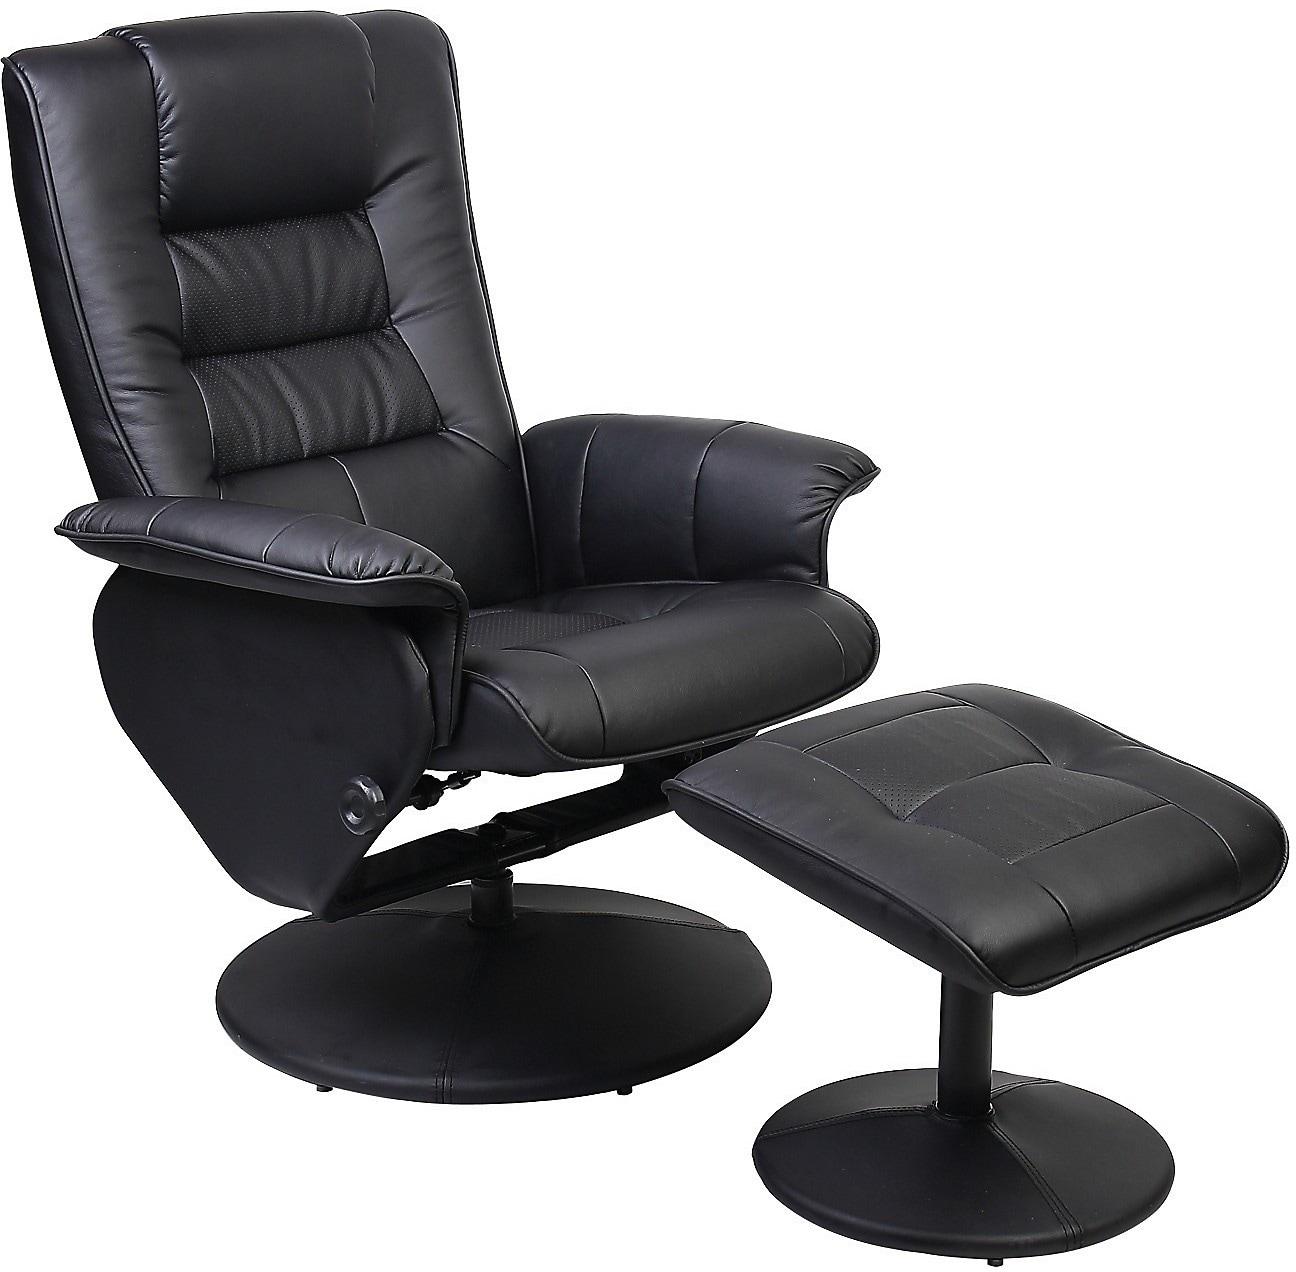 Living Room Furniture - Duncan Reclining Chair w/Ottoman - Black